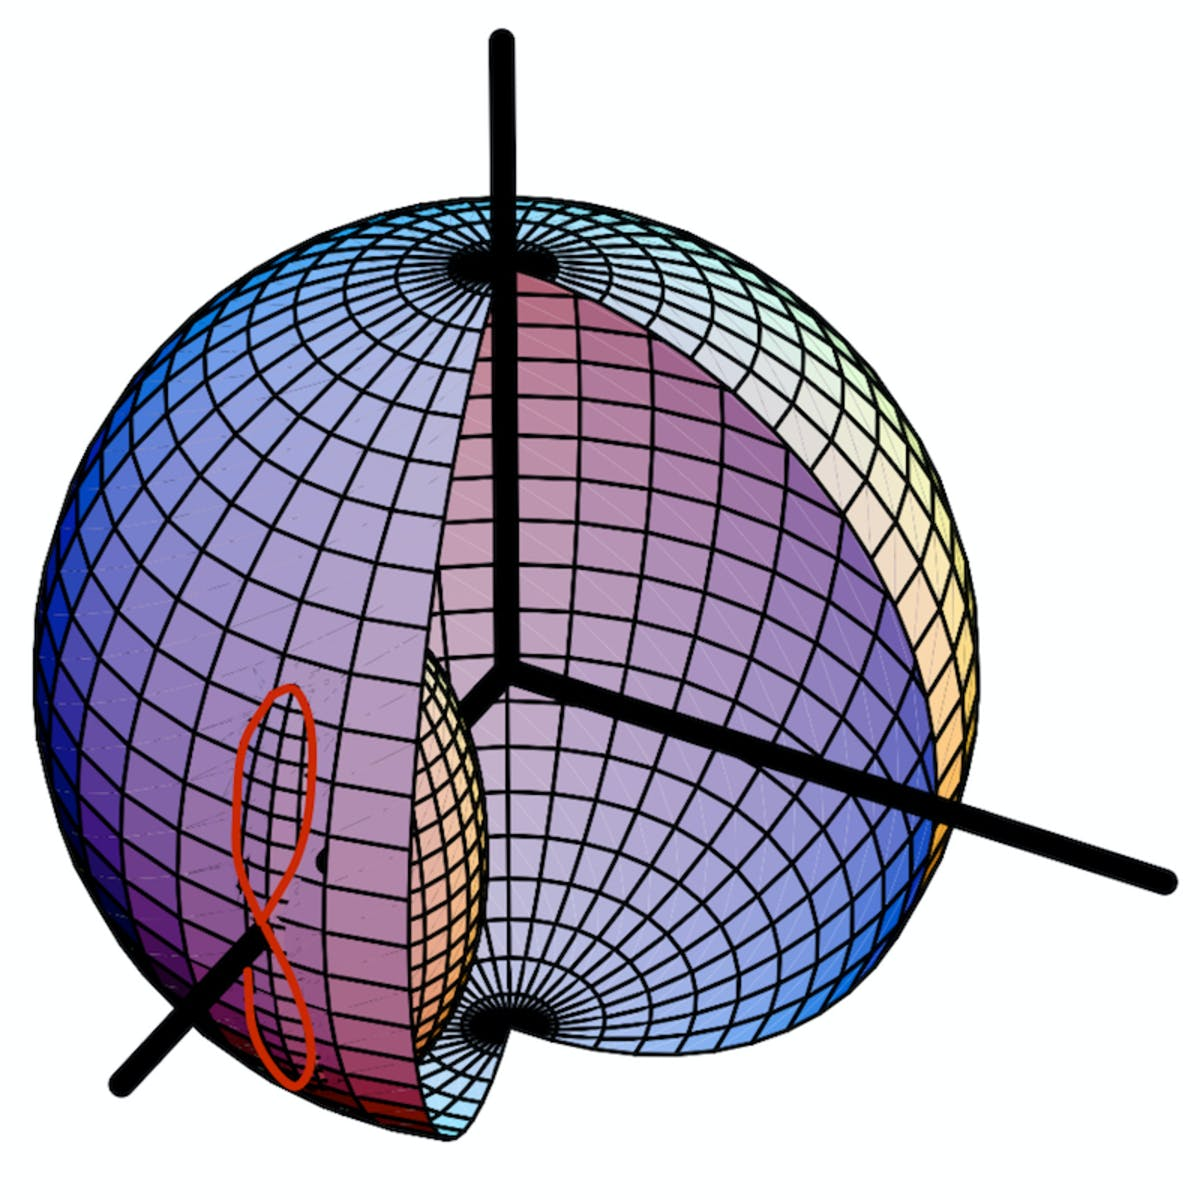 Kinetics: Studying Spacecraft Motion